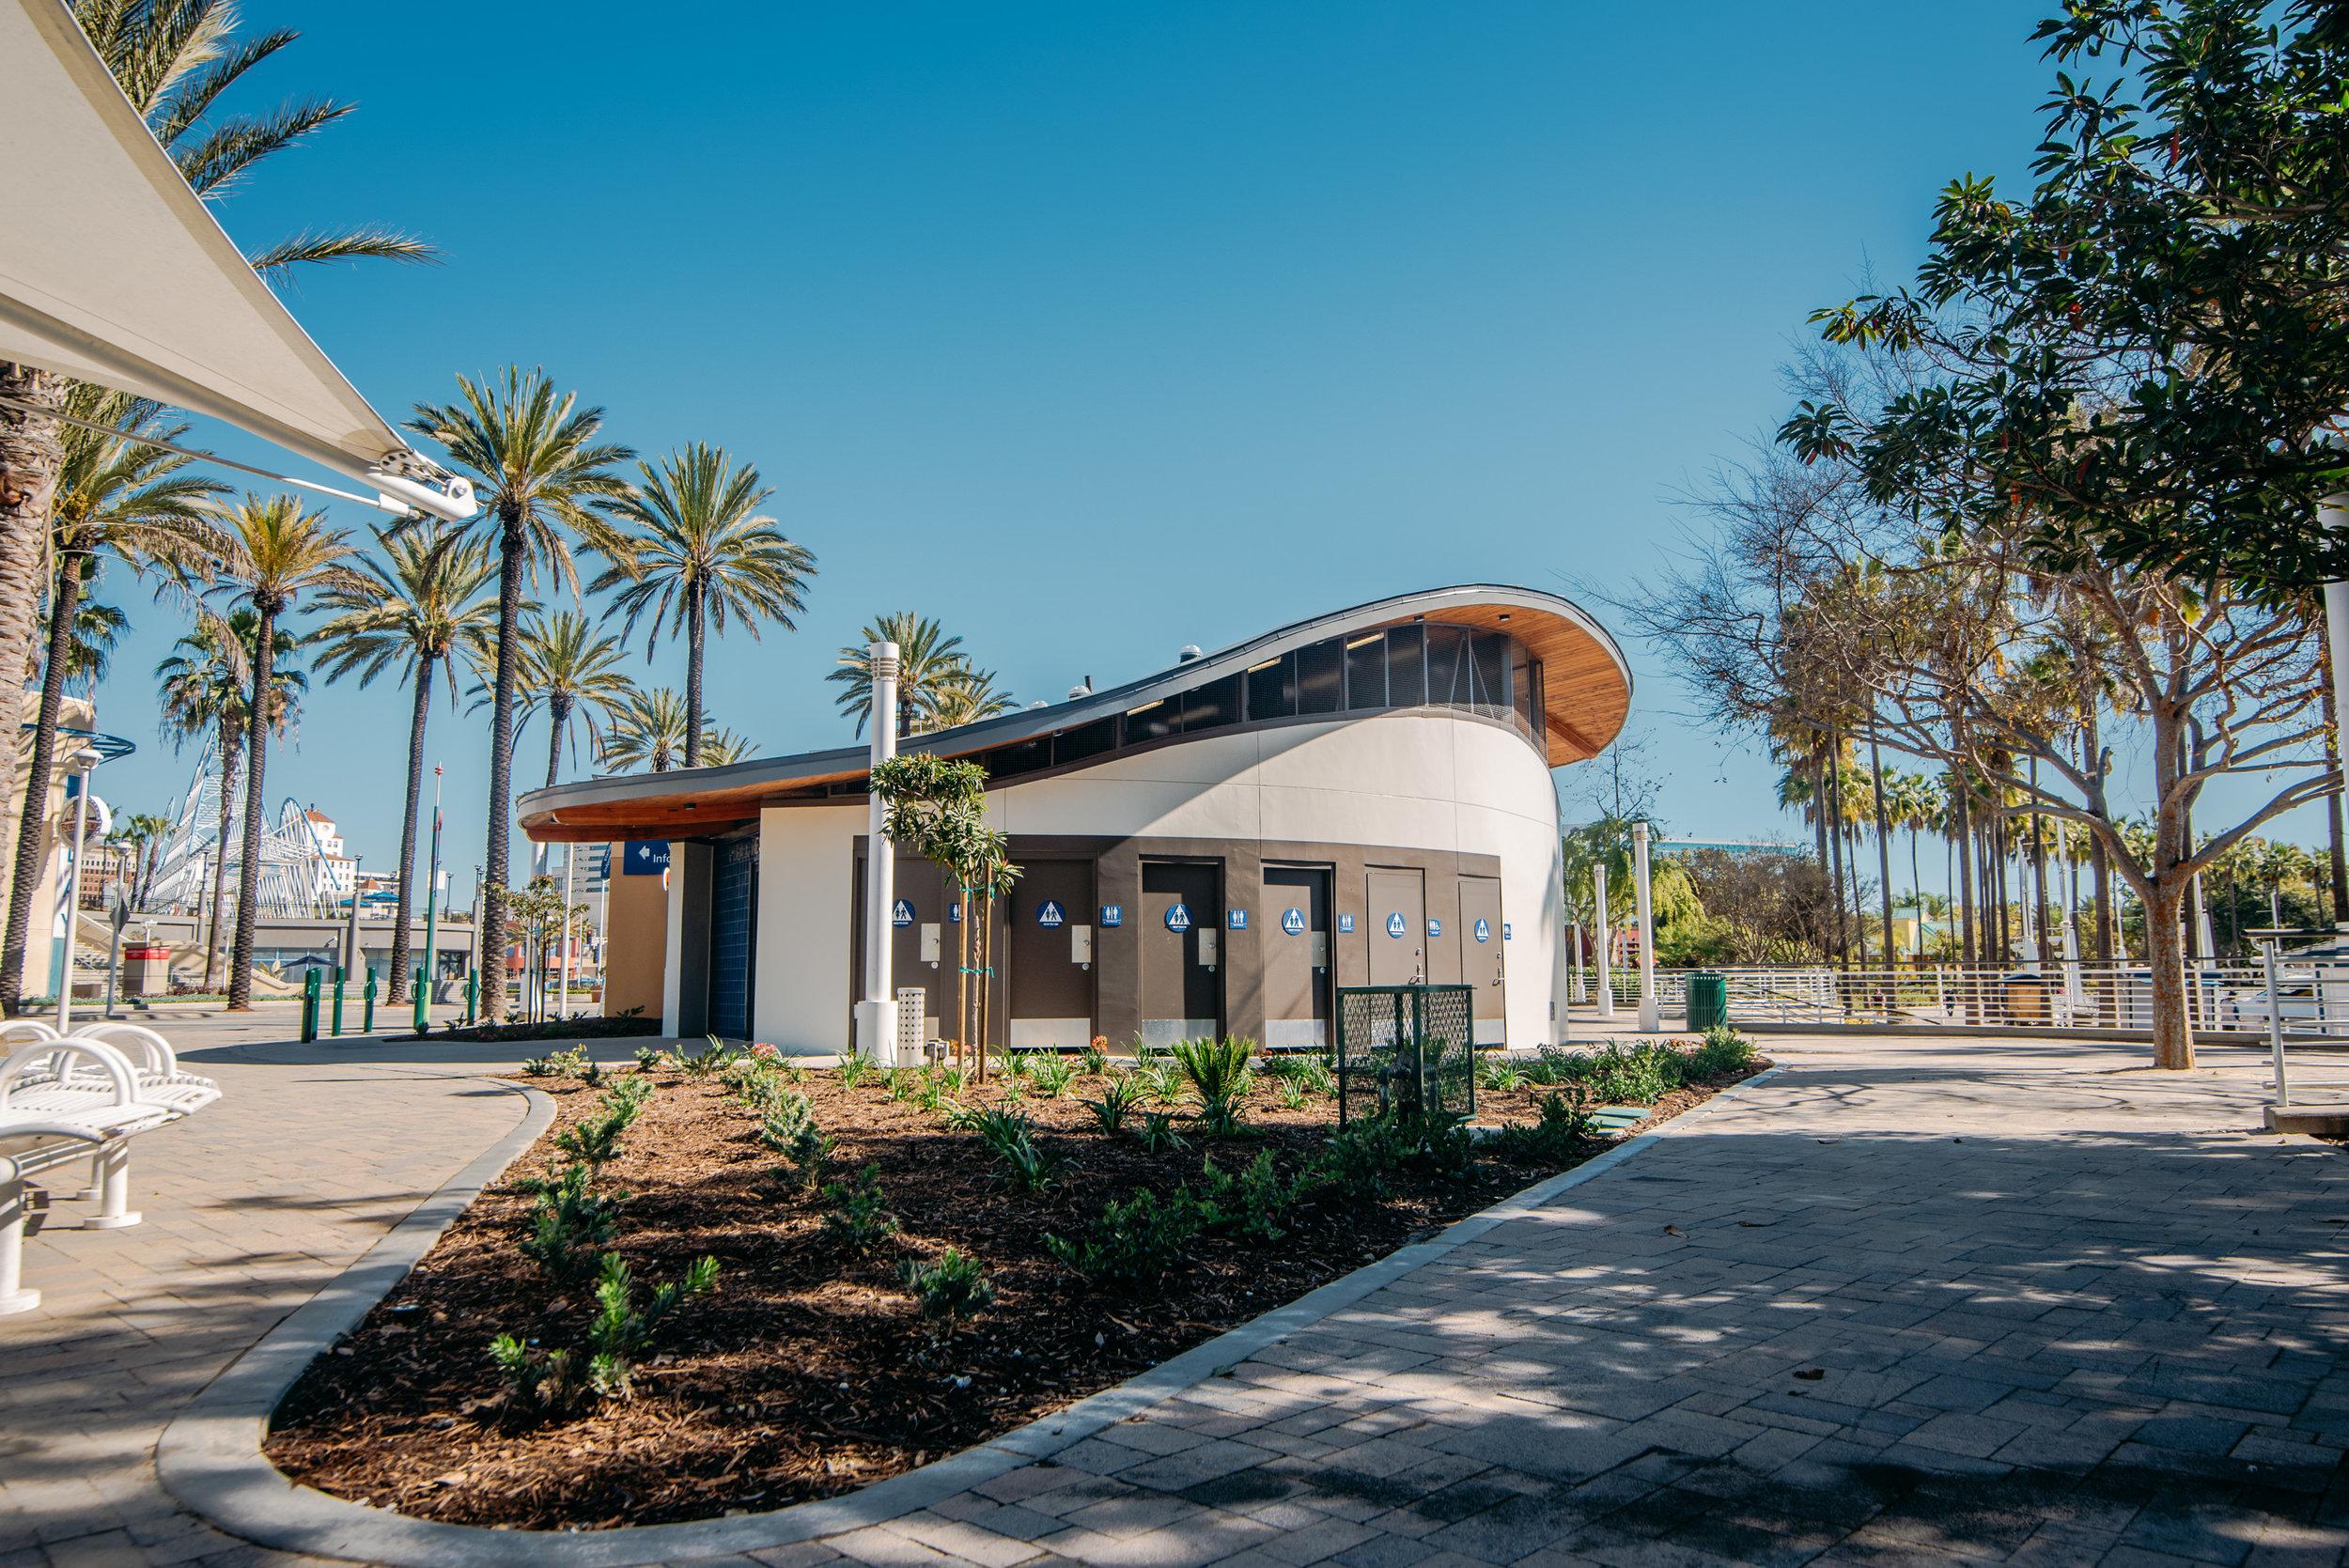 TIDELANDS RESTROOMS - CITY OF LONG BEACH